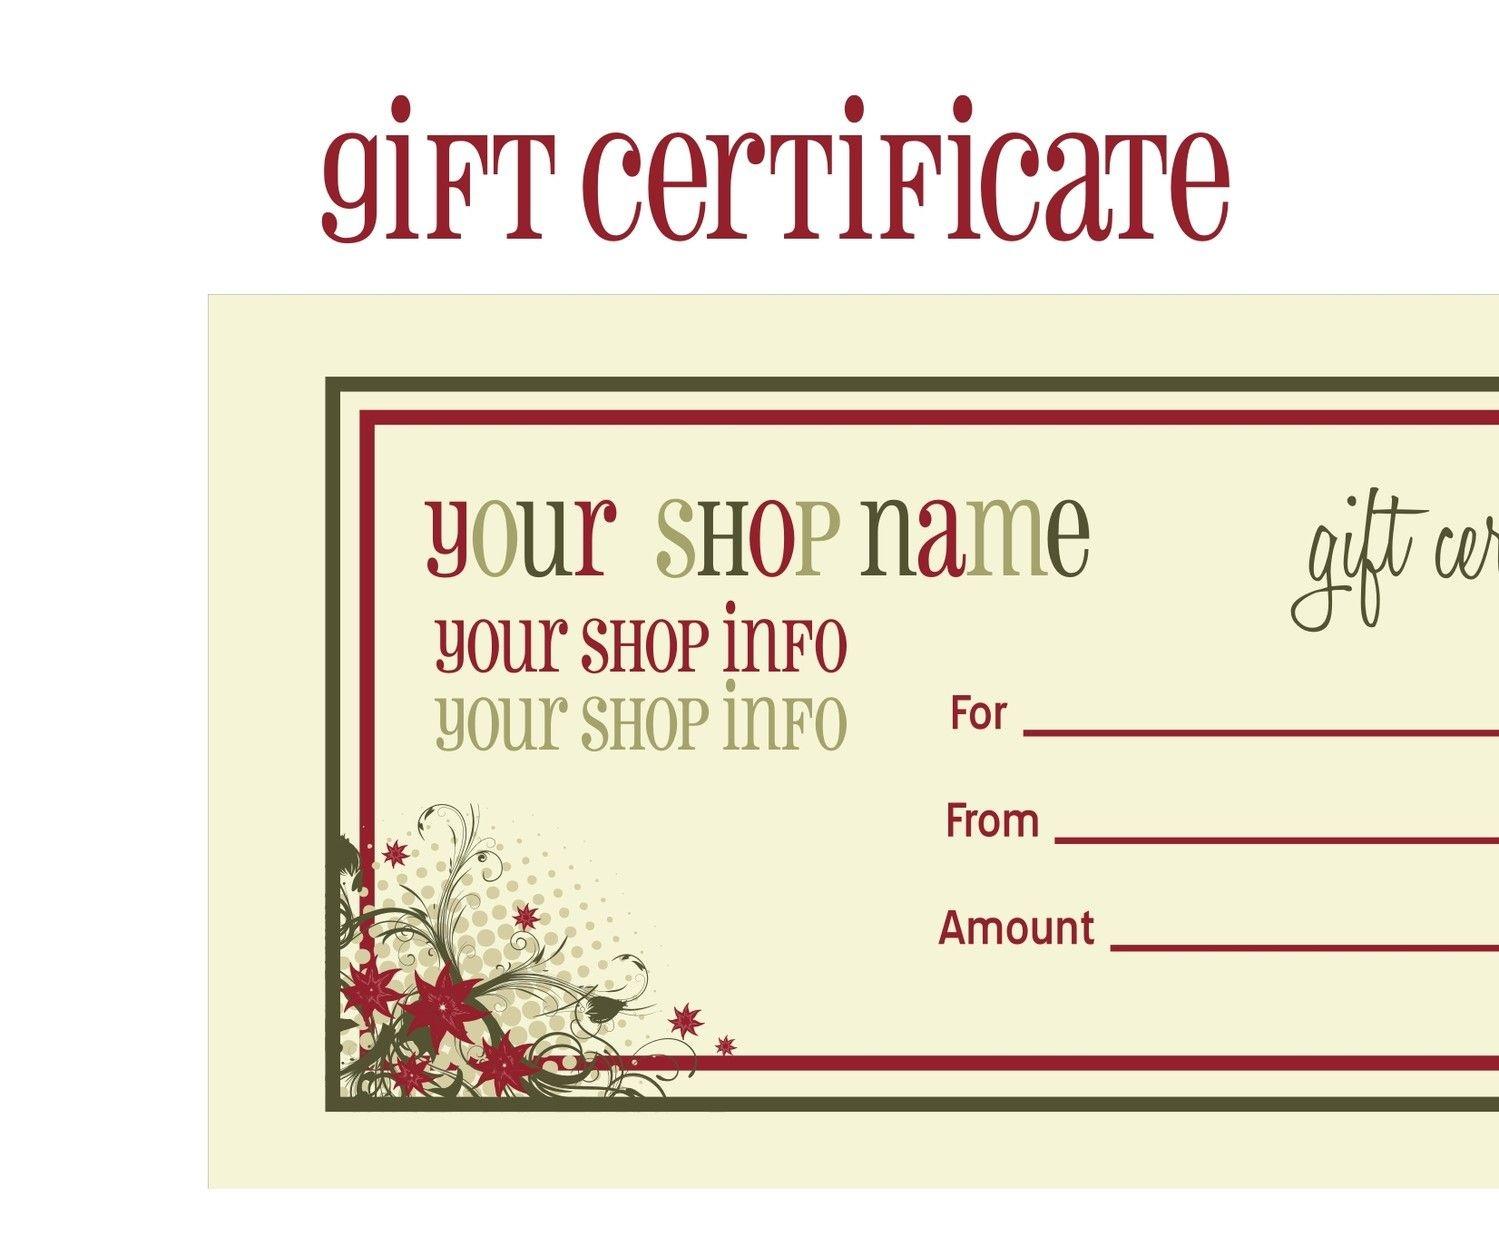 Certificates Printable Calendars Free Printable Avon Gift - Free Printable Massage Gift Certificate Templates